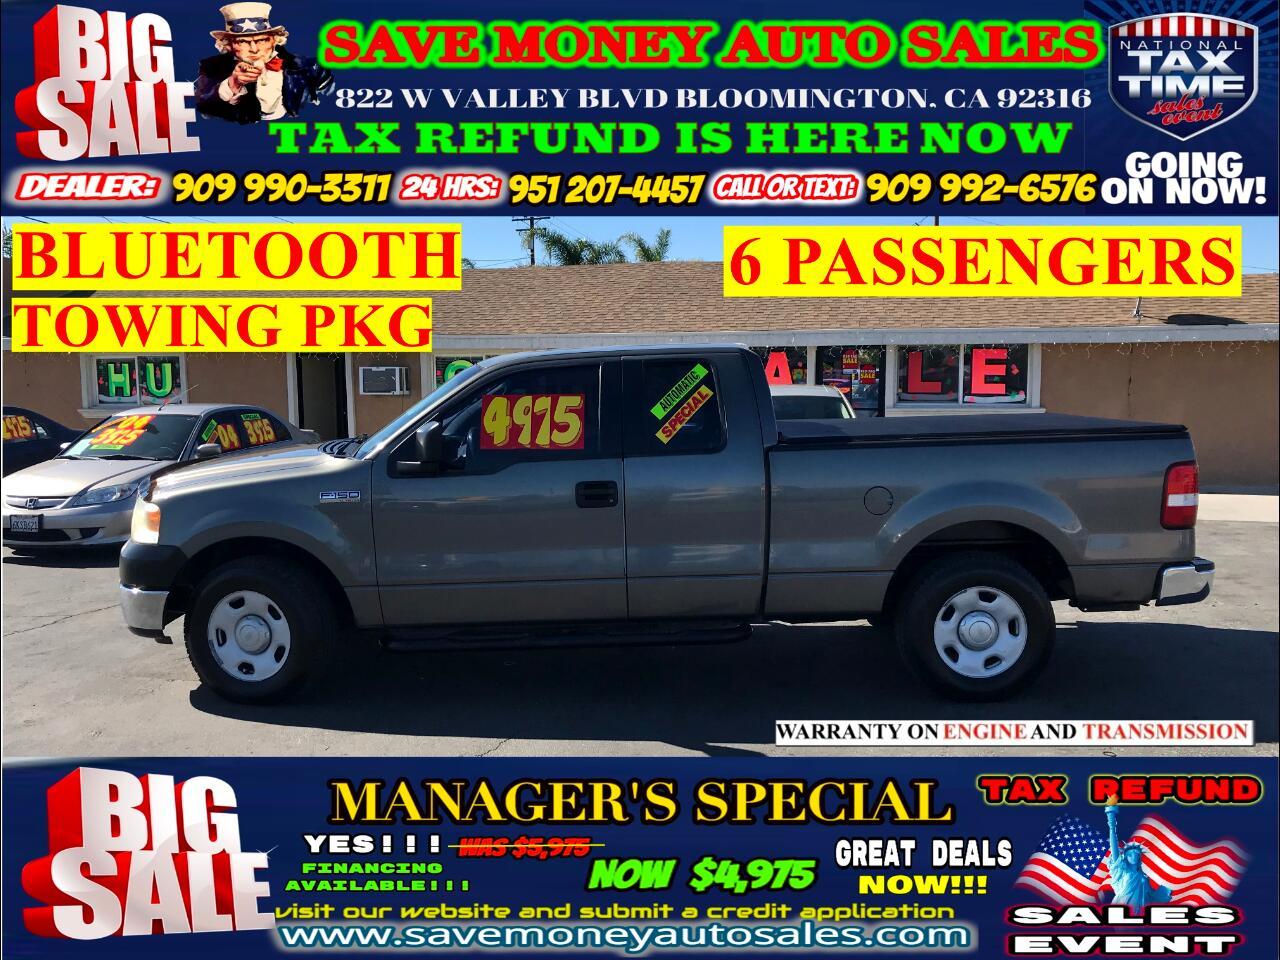 2005 Ford F-150 4.6 XL TRITON> 6 PASSENGERS> TOWING PKG> BLUETOOTH